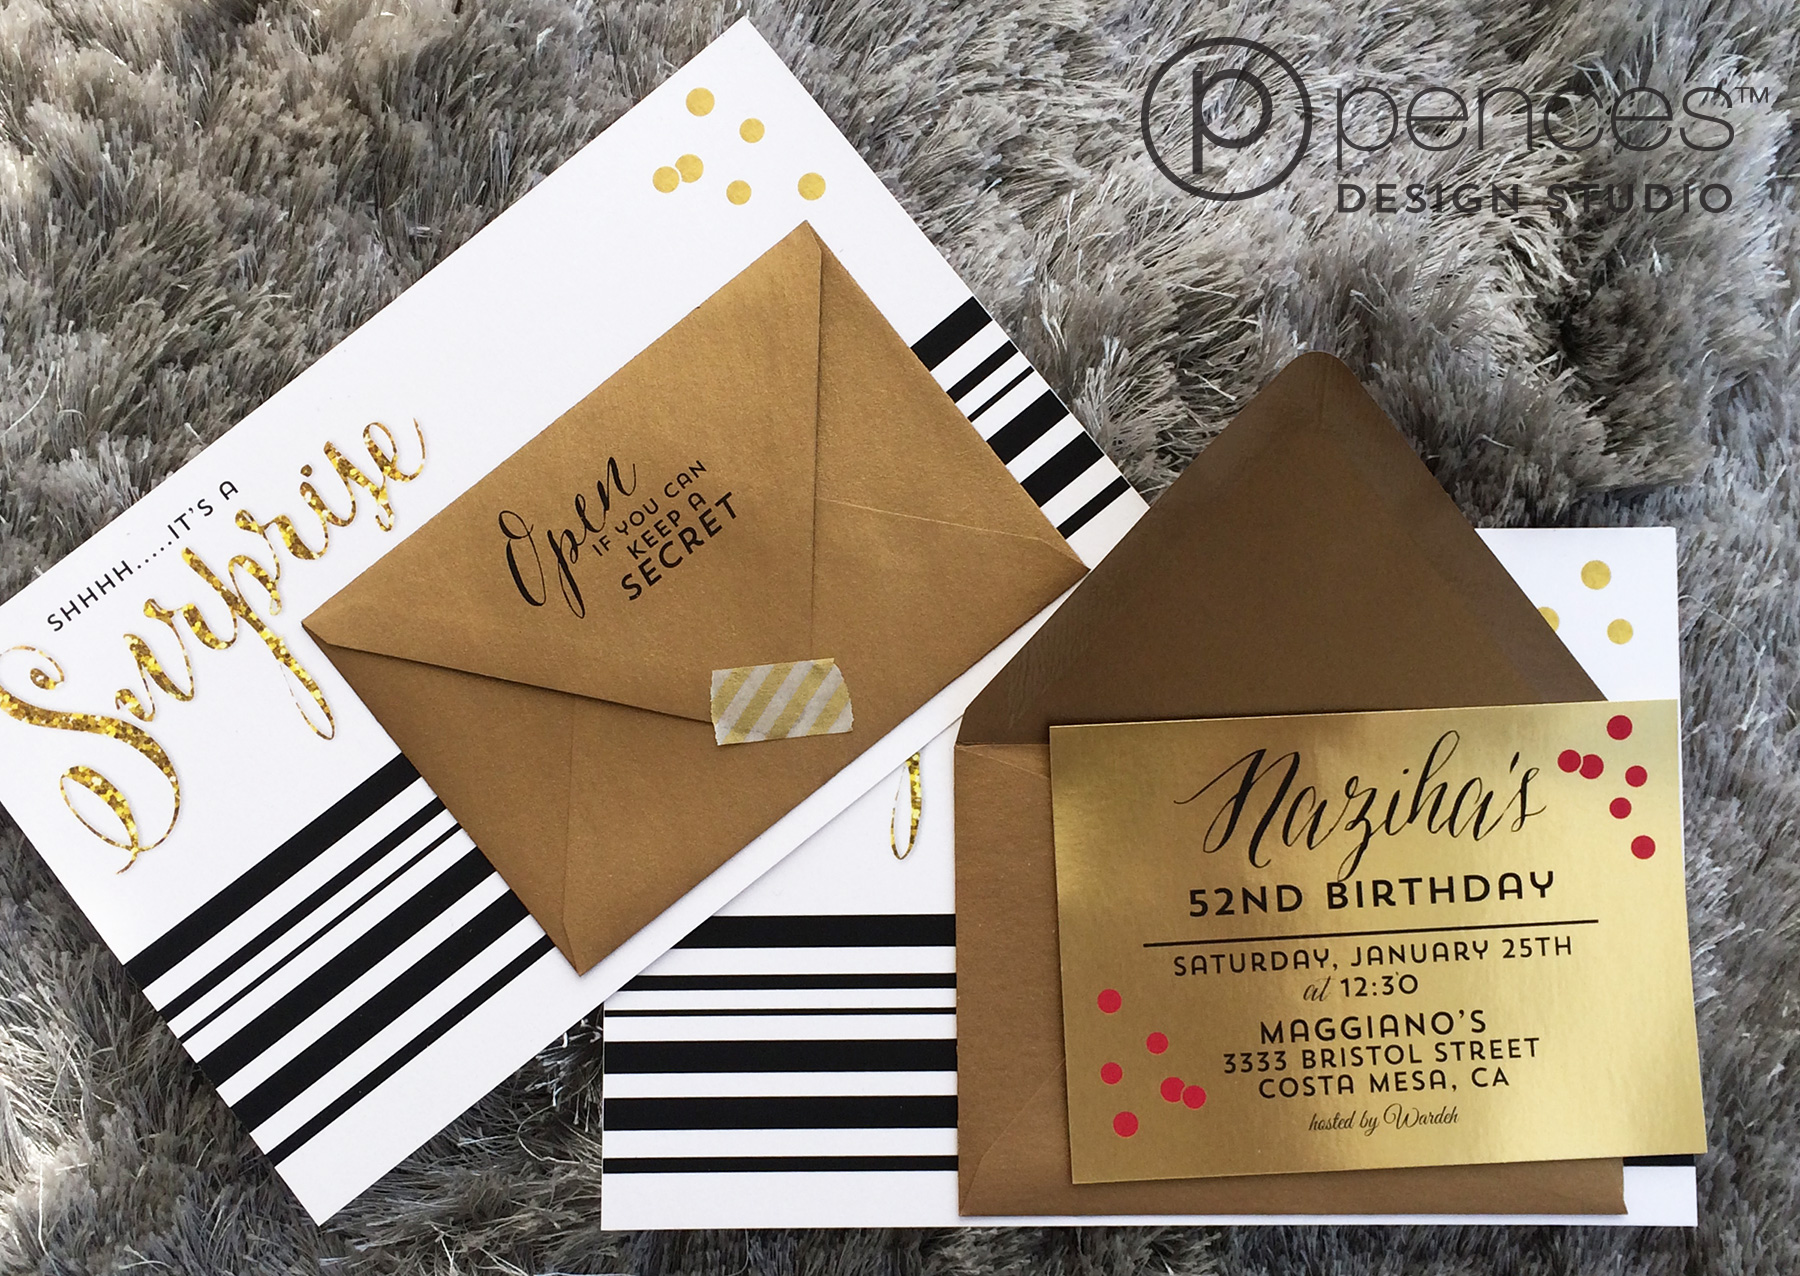 pences-invite23-goldsurprise.jpg